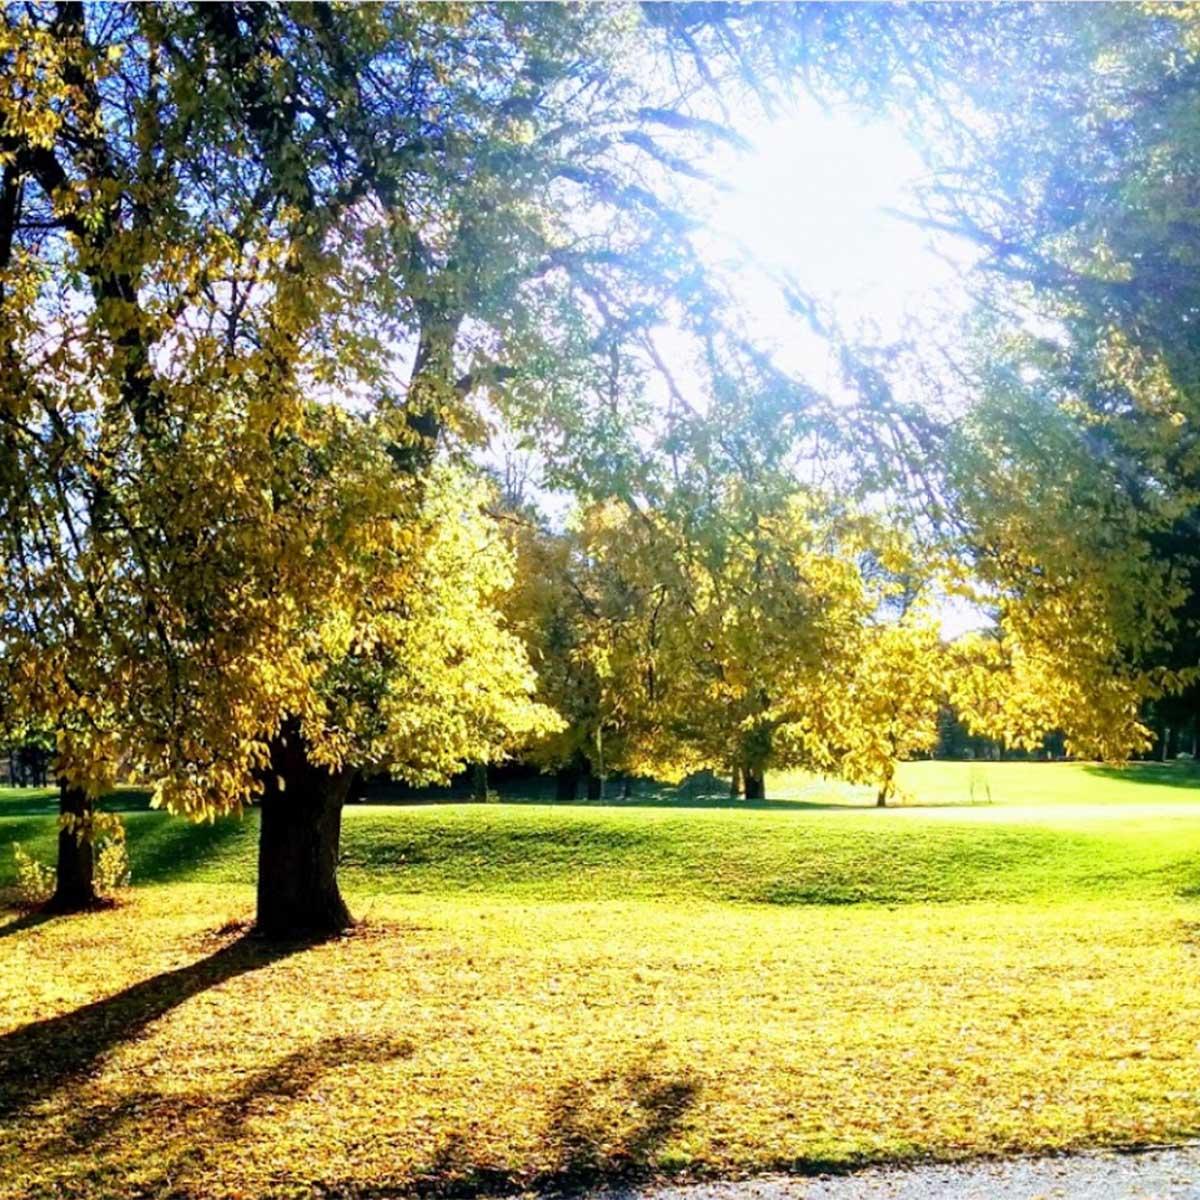 Scenes around the parkland layout at Yowani Country Club